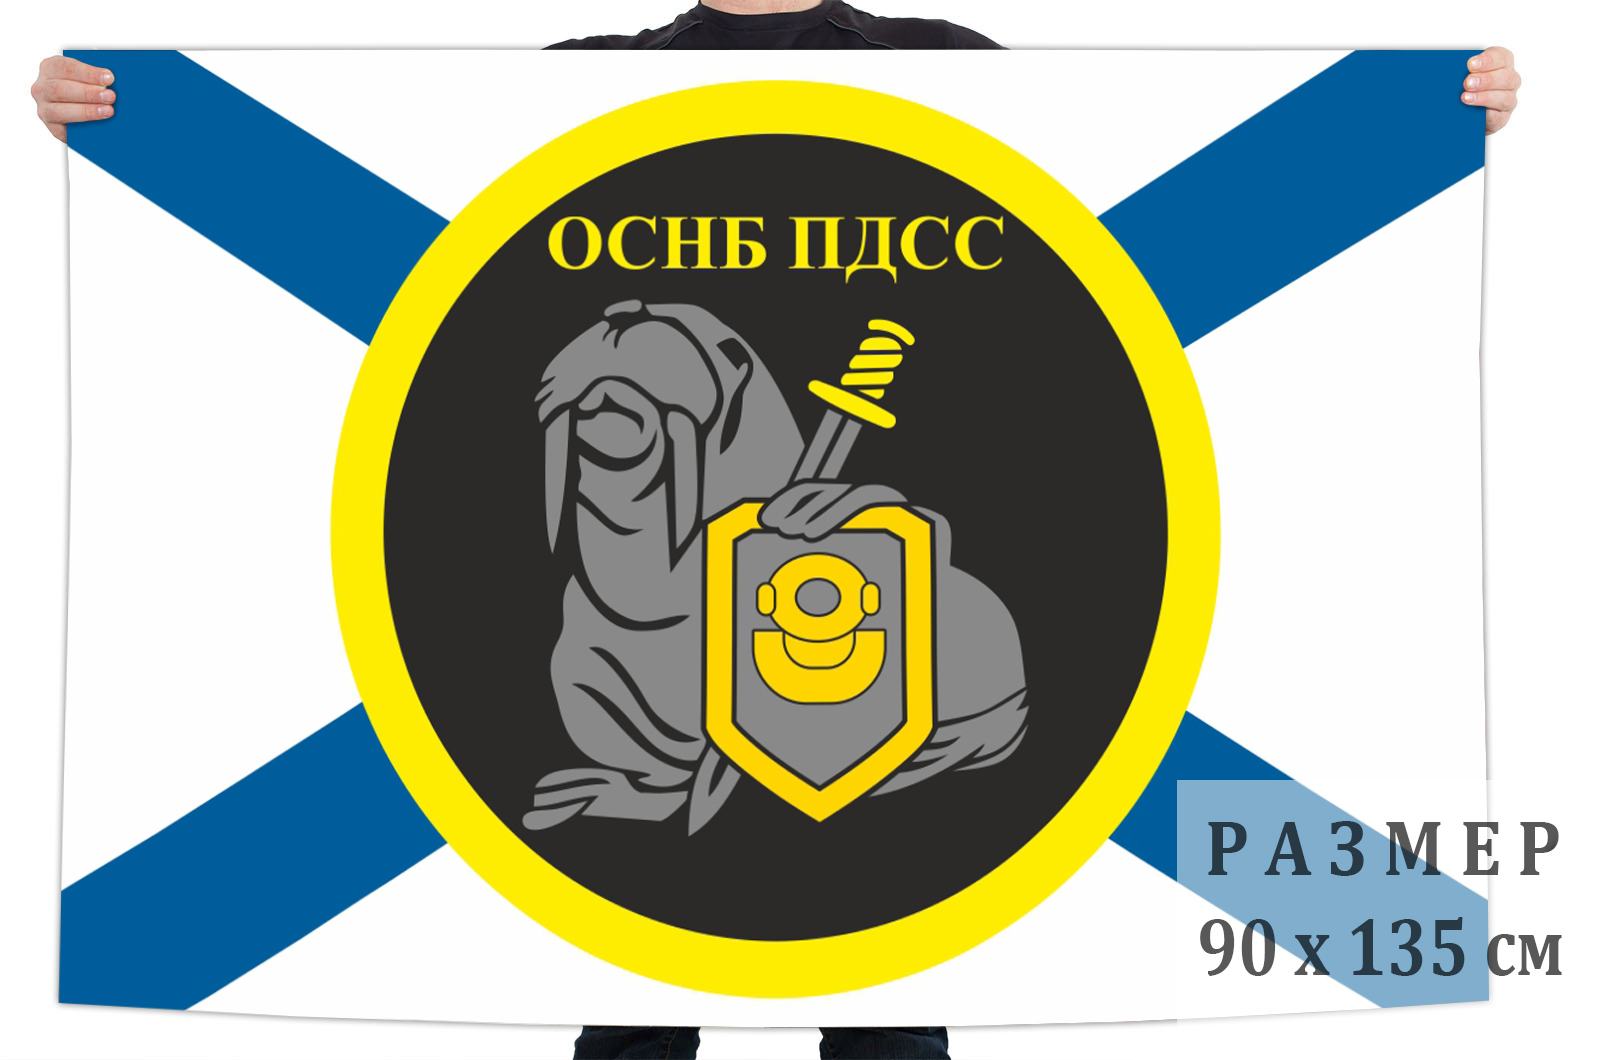 Флаг ОСНБ ПДСС